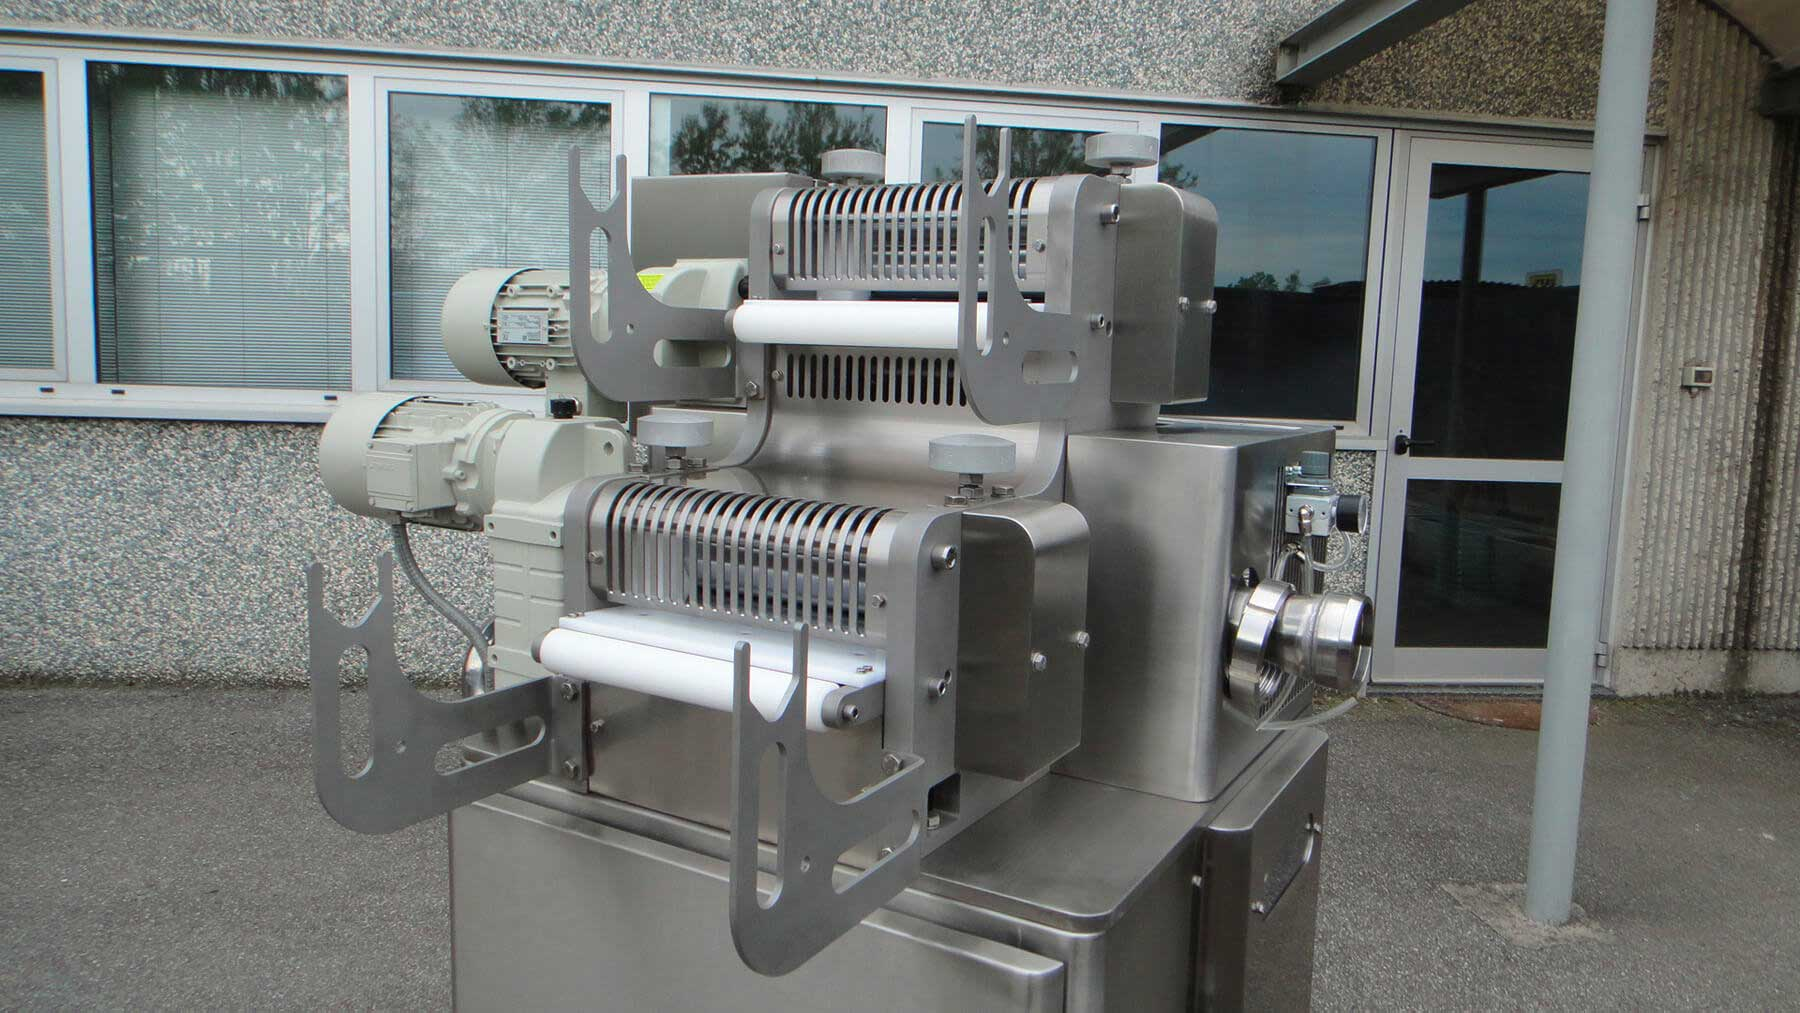 AUTOMATIC RAVIOLI FORMING MACHINE model TA/250